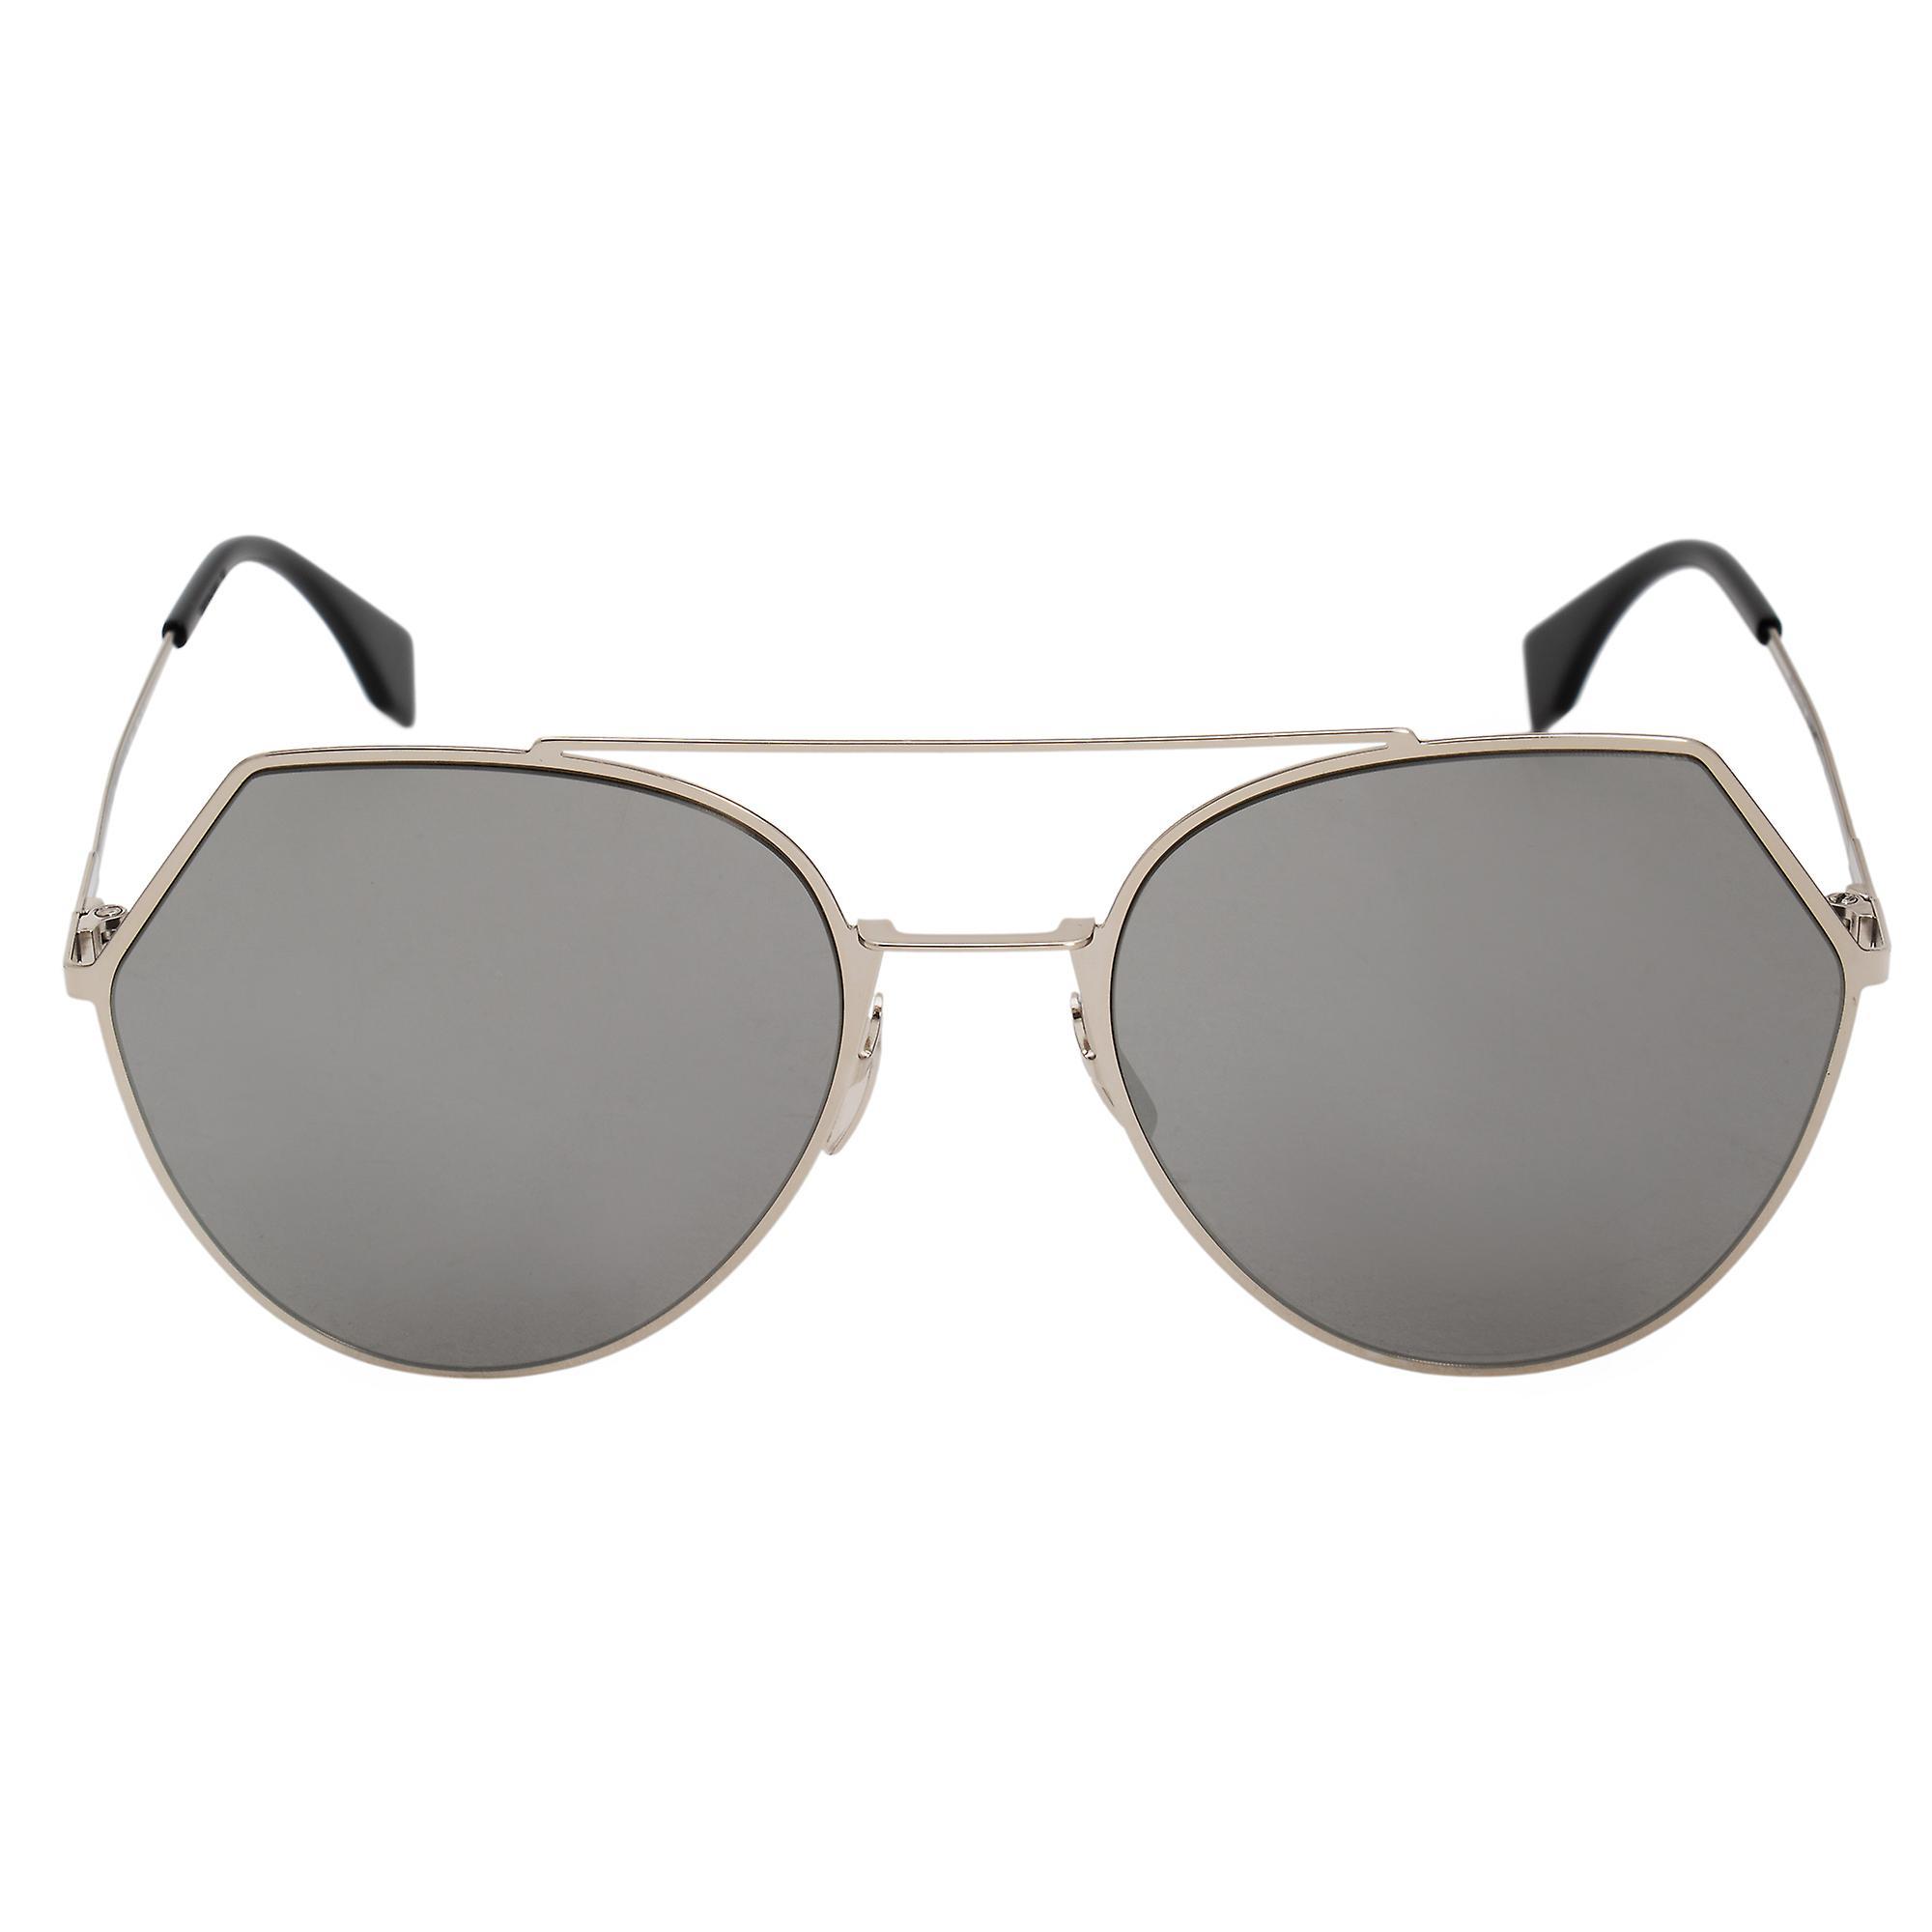 Fendi Eyeline Pilot Sunglasses FF0194S 3YG 0T 55